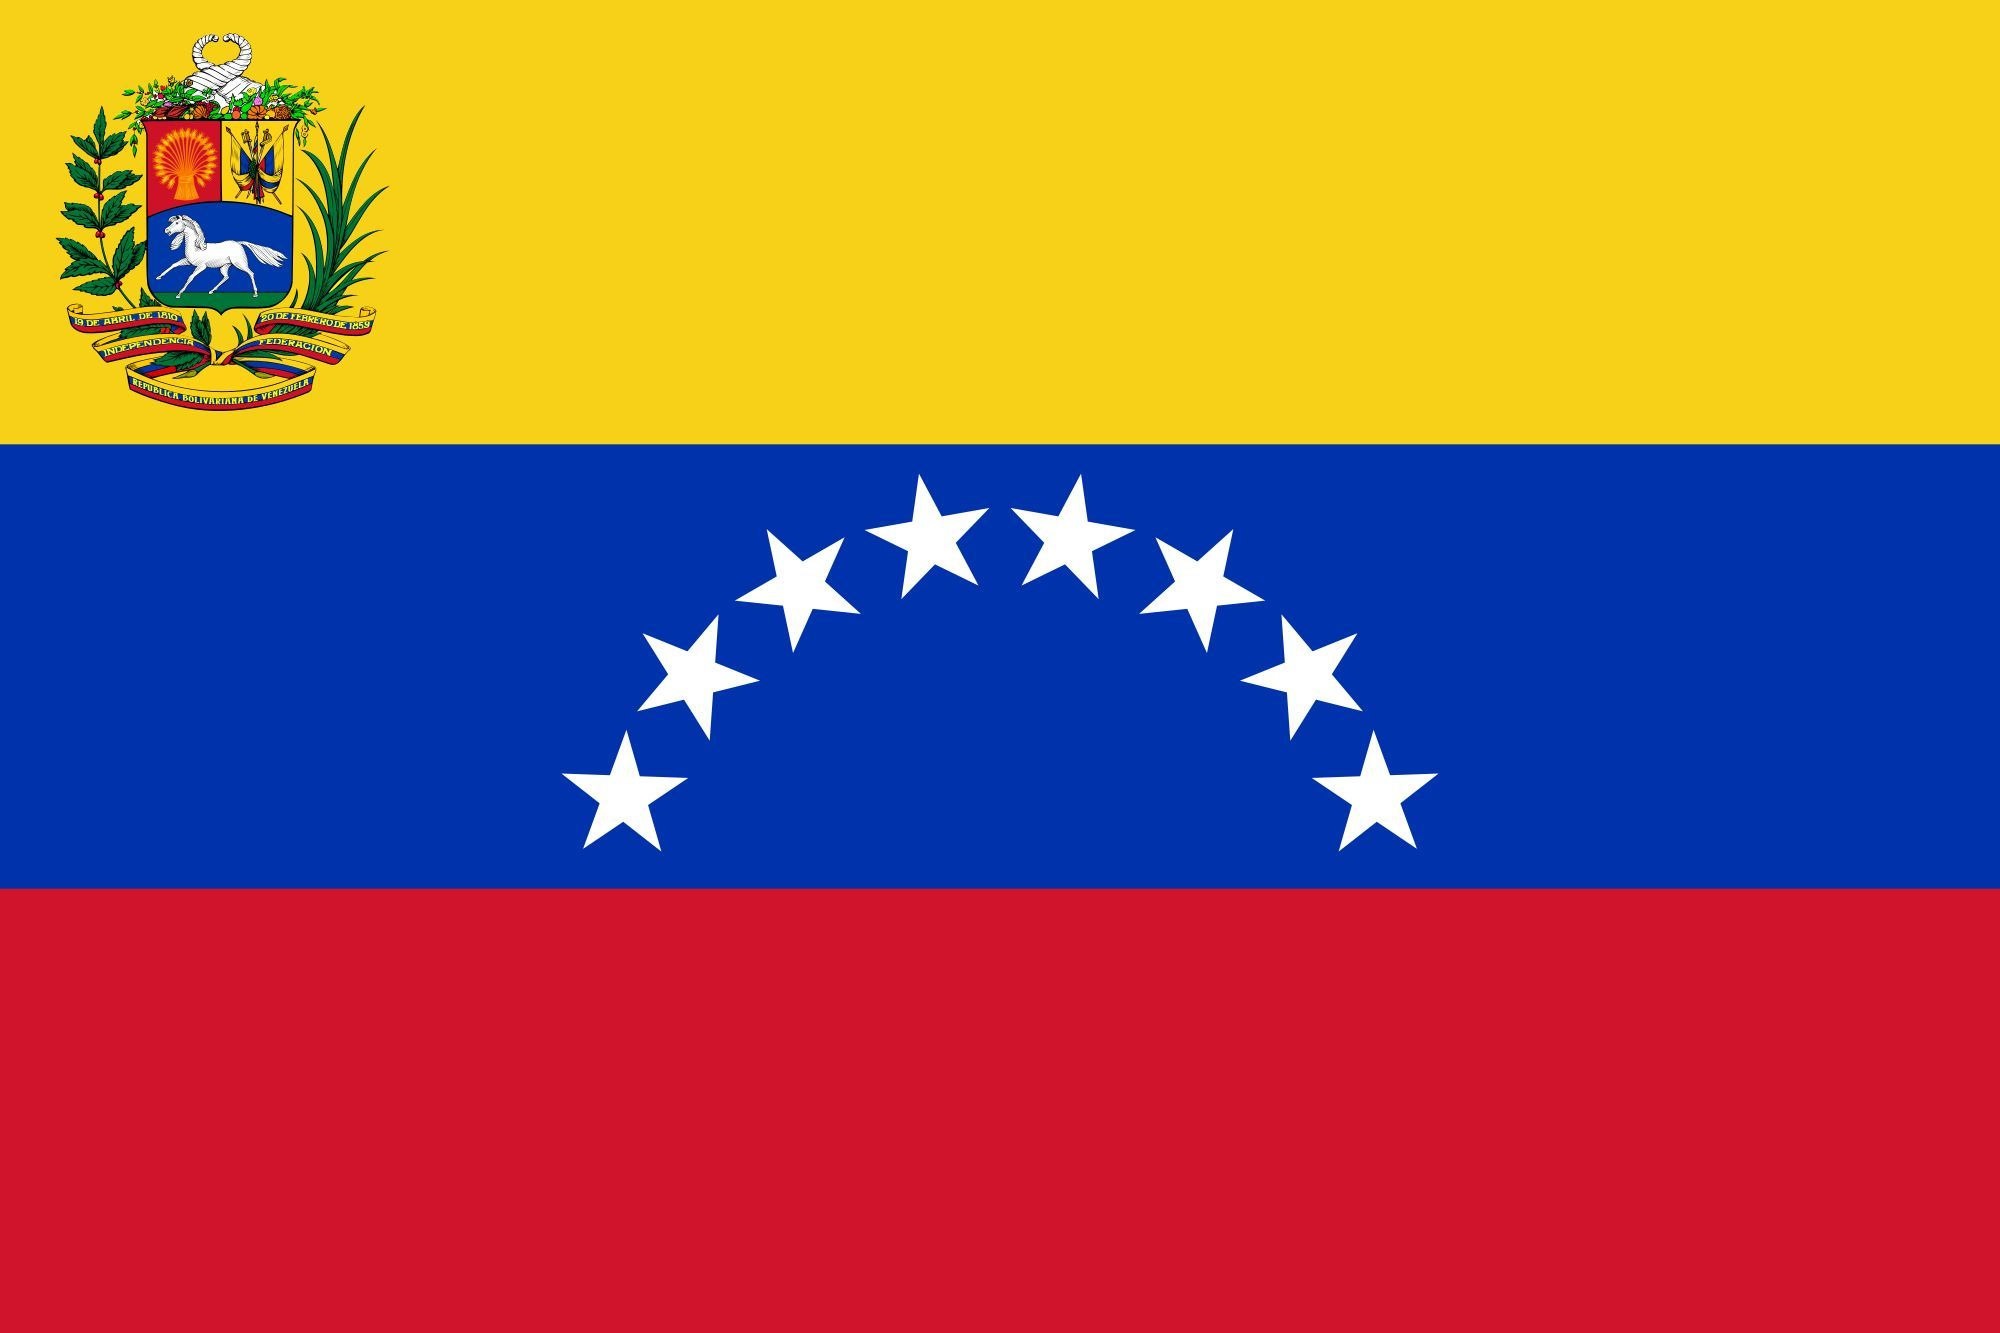 Ahora vamos a almorzar a Venezuela